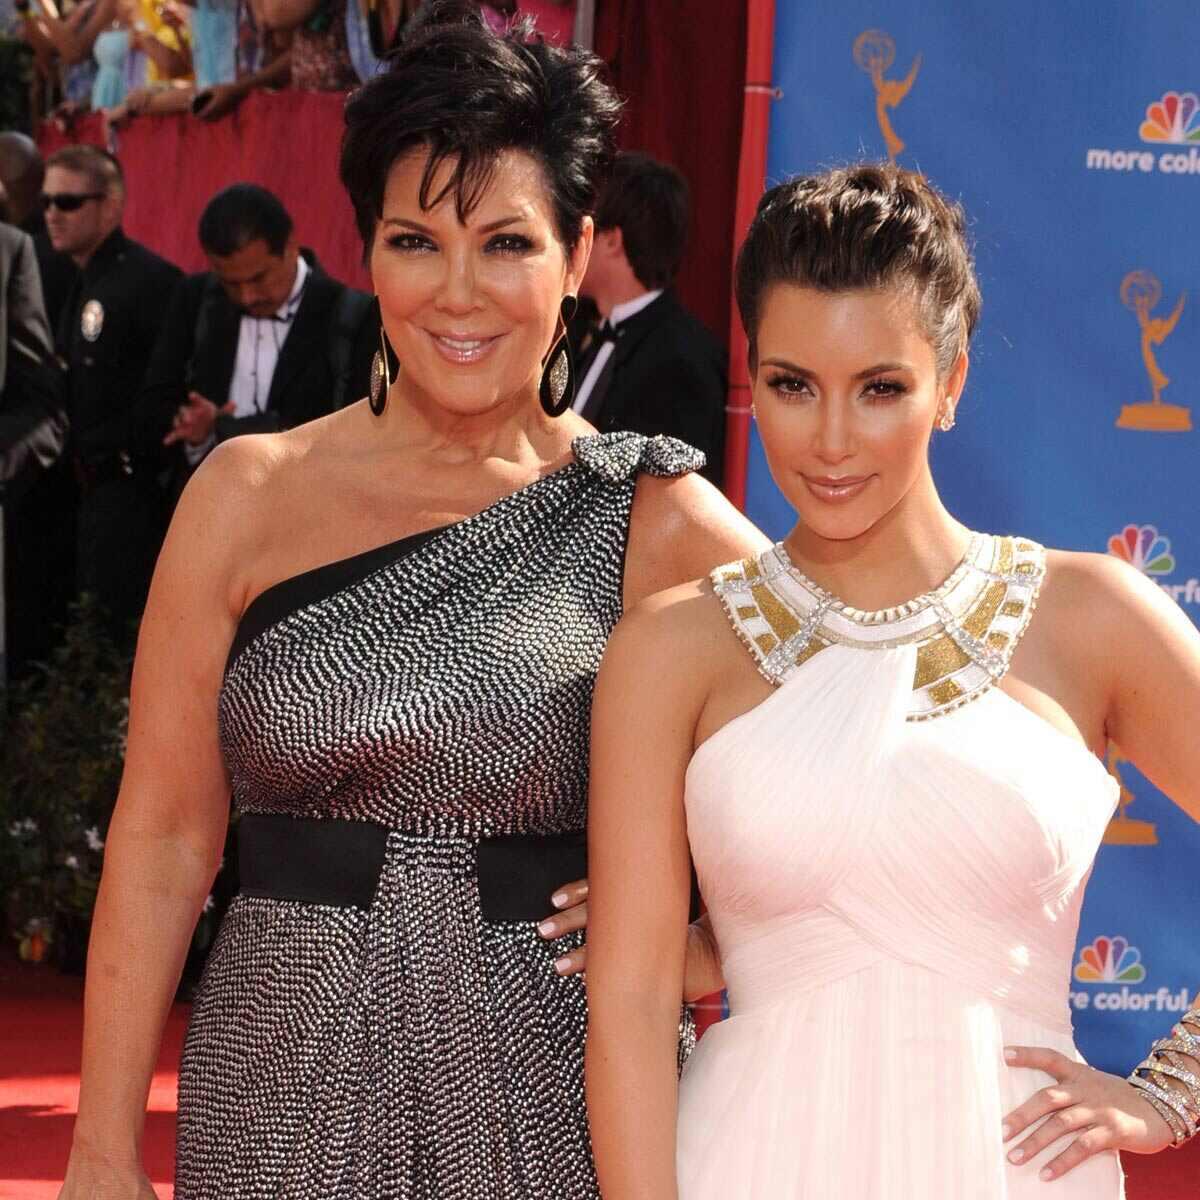 2010 Emmys, Kim Kardashian, Kris Jenner